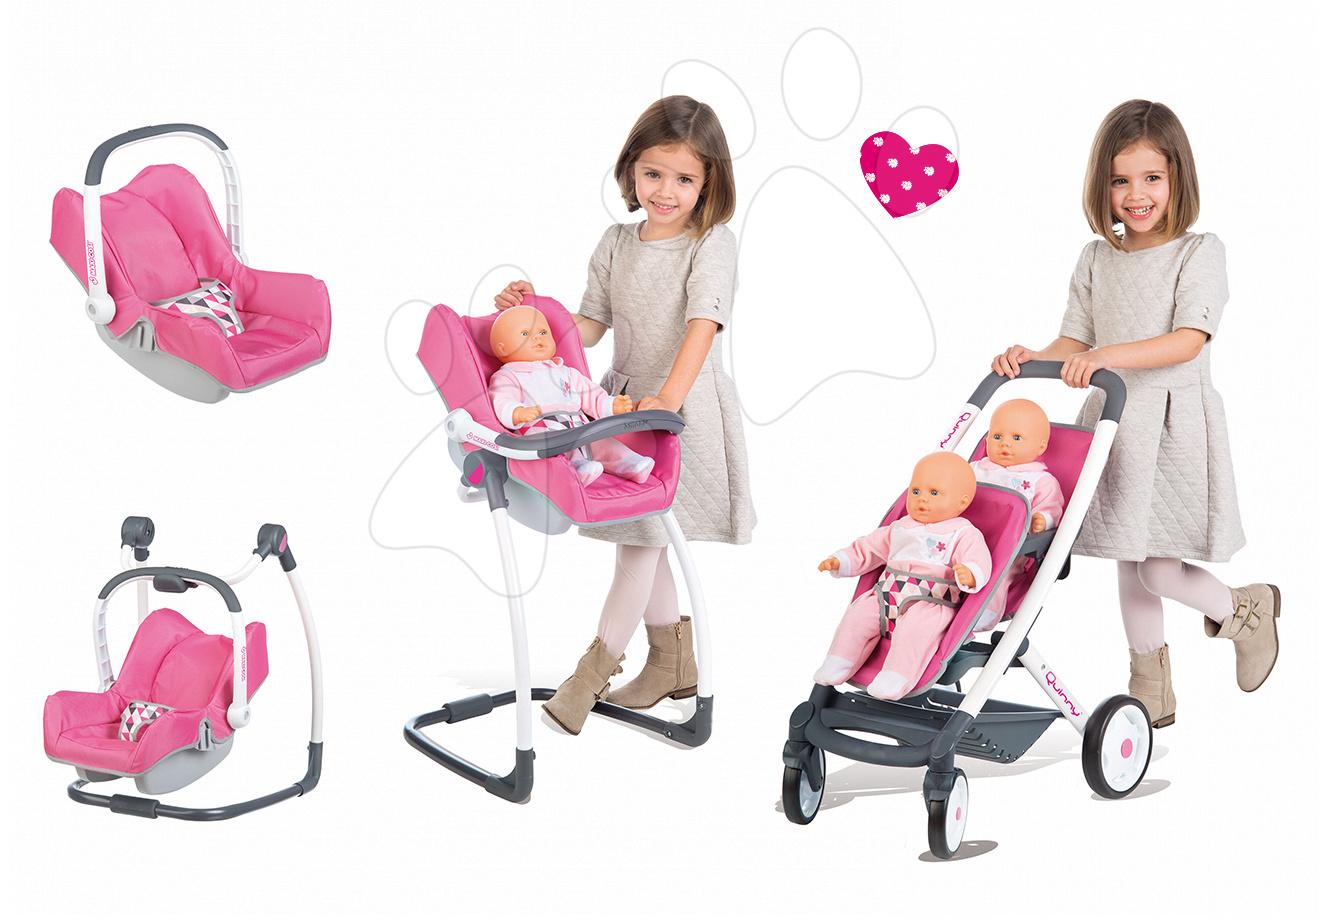 Set dětský kočárek pro dvě panenky 4v1 retro Maxi Cosi & Quinny Smoby (65,5 cm ručka) a židle, houpačka s autosedačkou